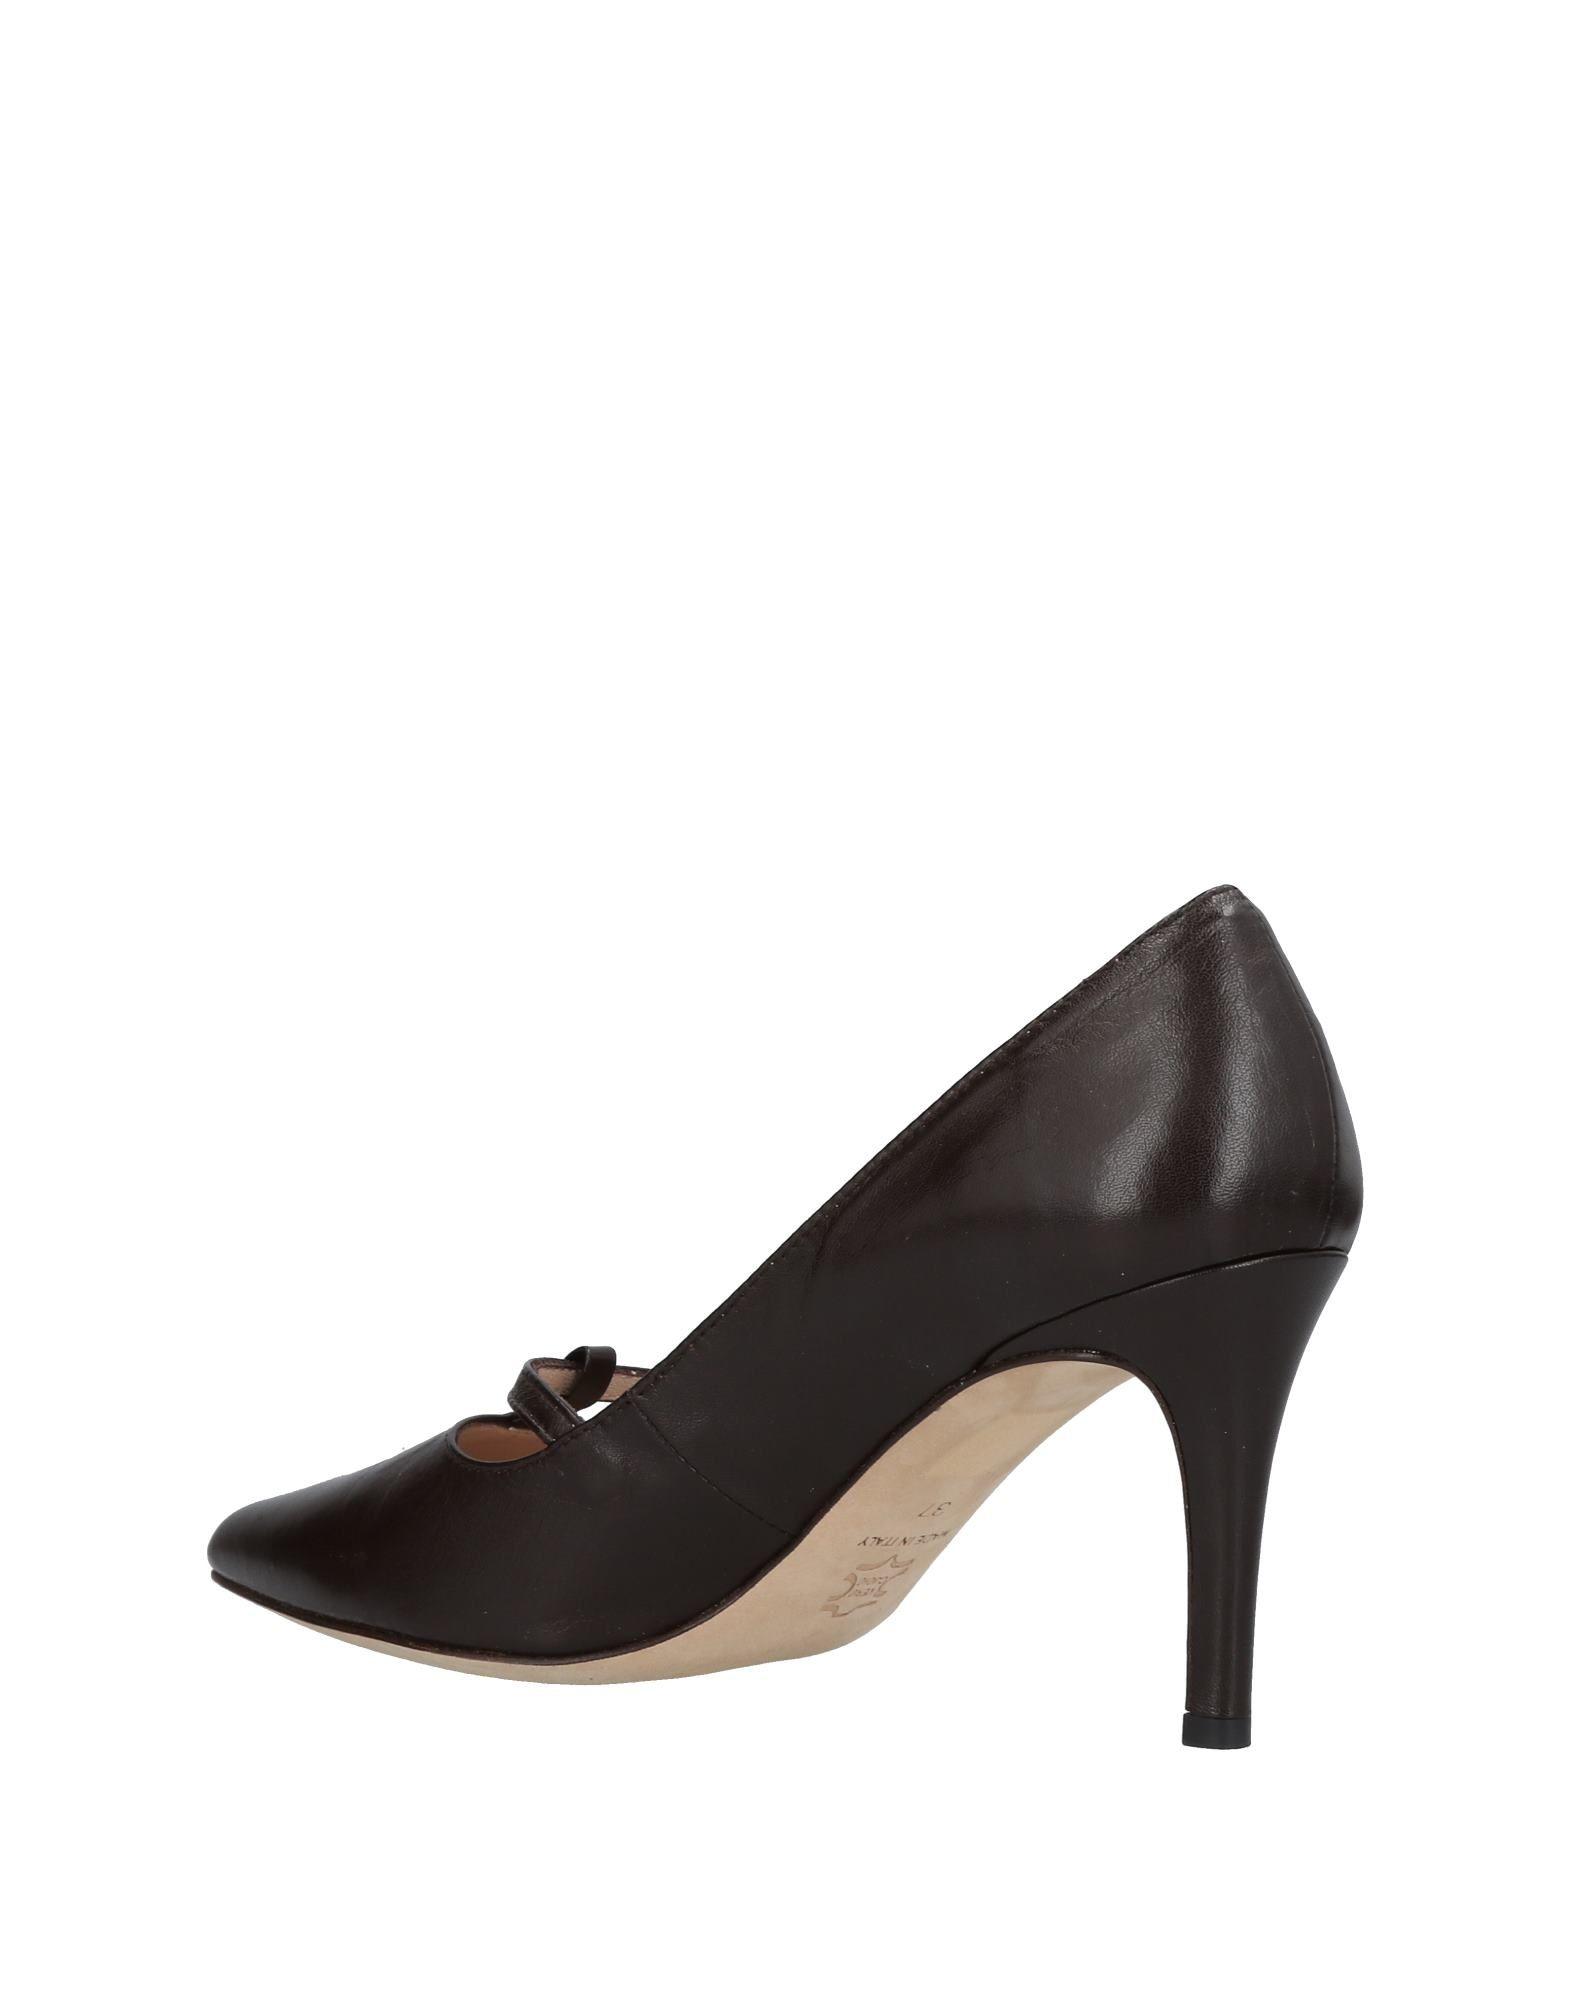 Cristina 11457974UK Millotti Pumps Damen  11457974UK Cristina Gute Qualität beliebte Schuhe 2db370